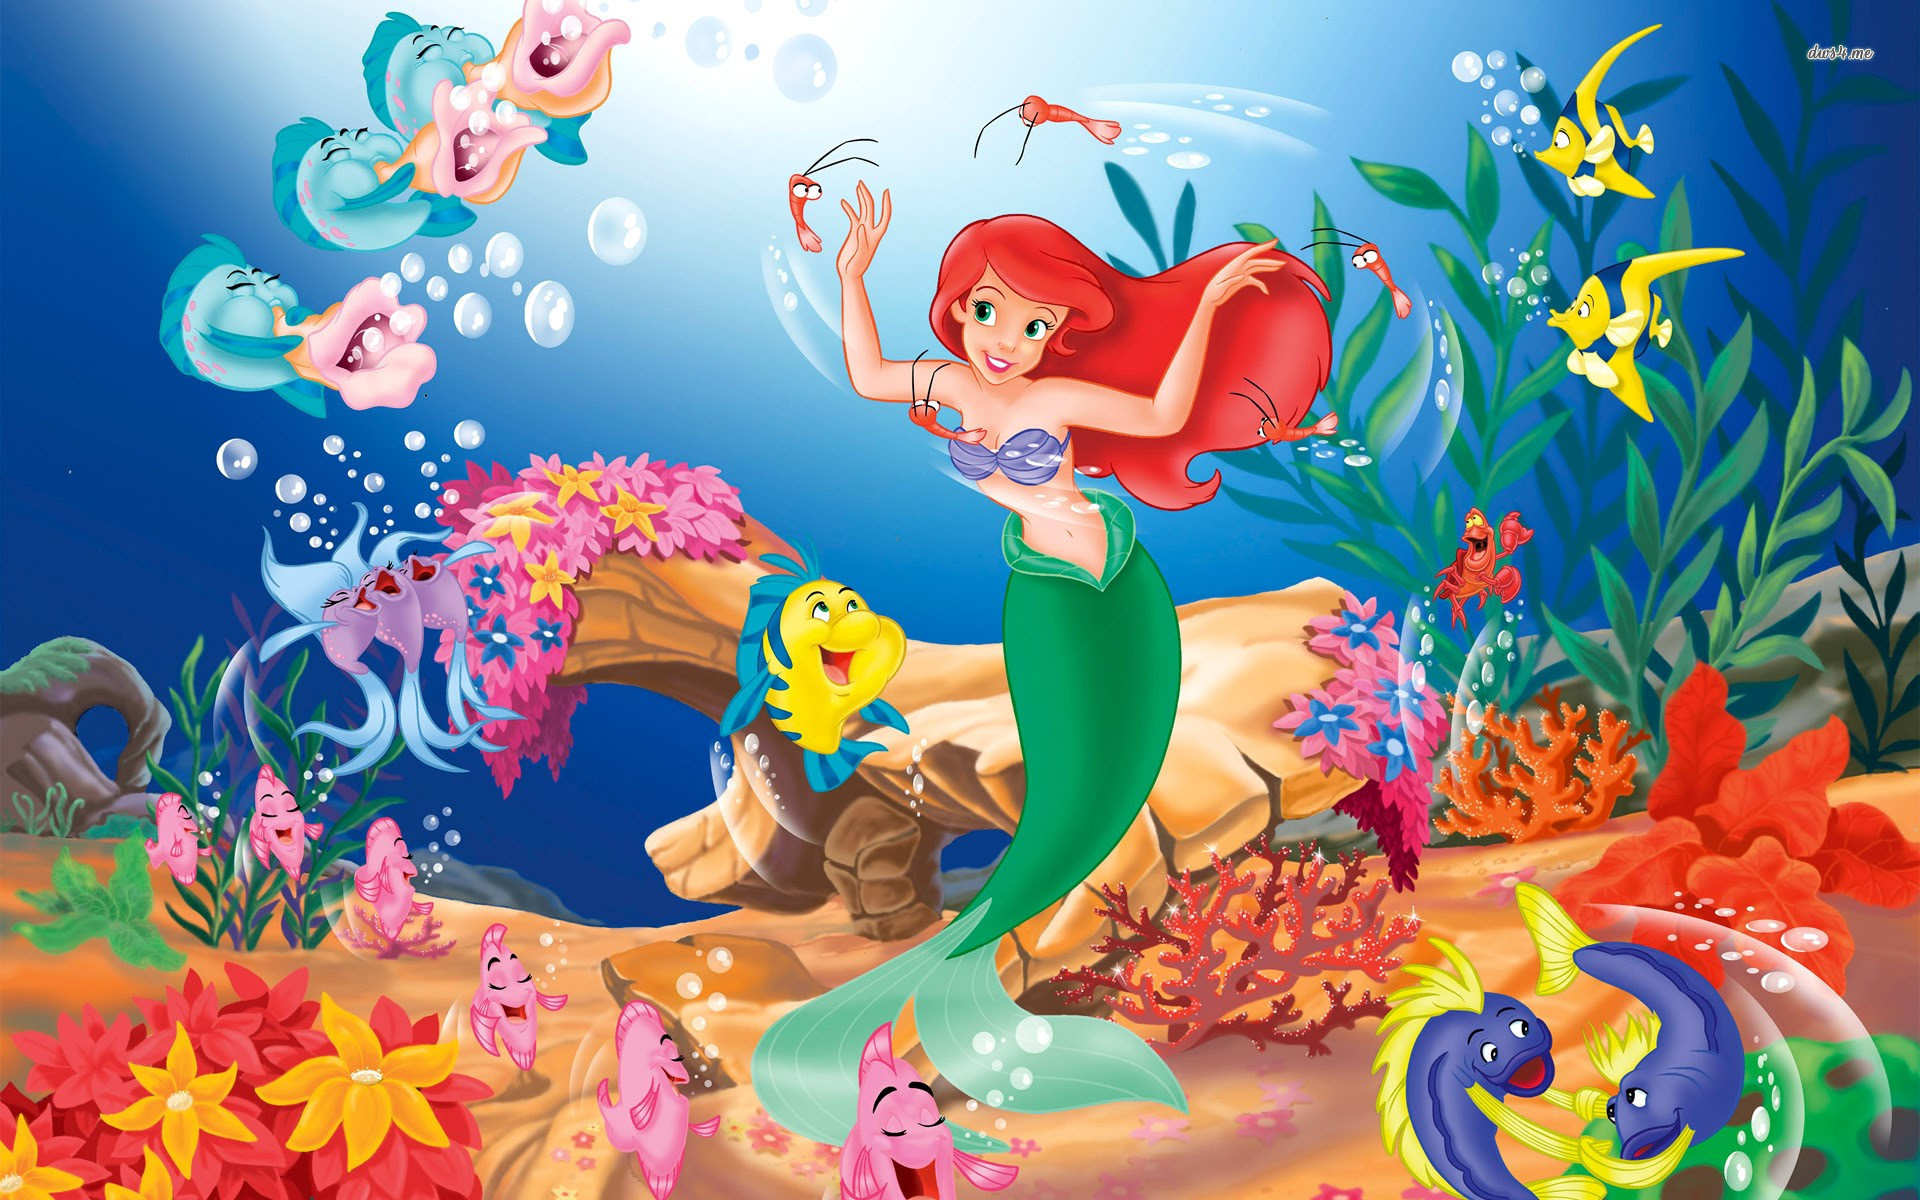 Disney Cartoon Wallpaper 55 Images